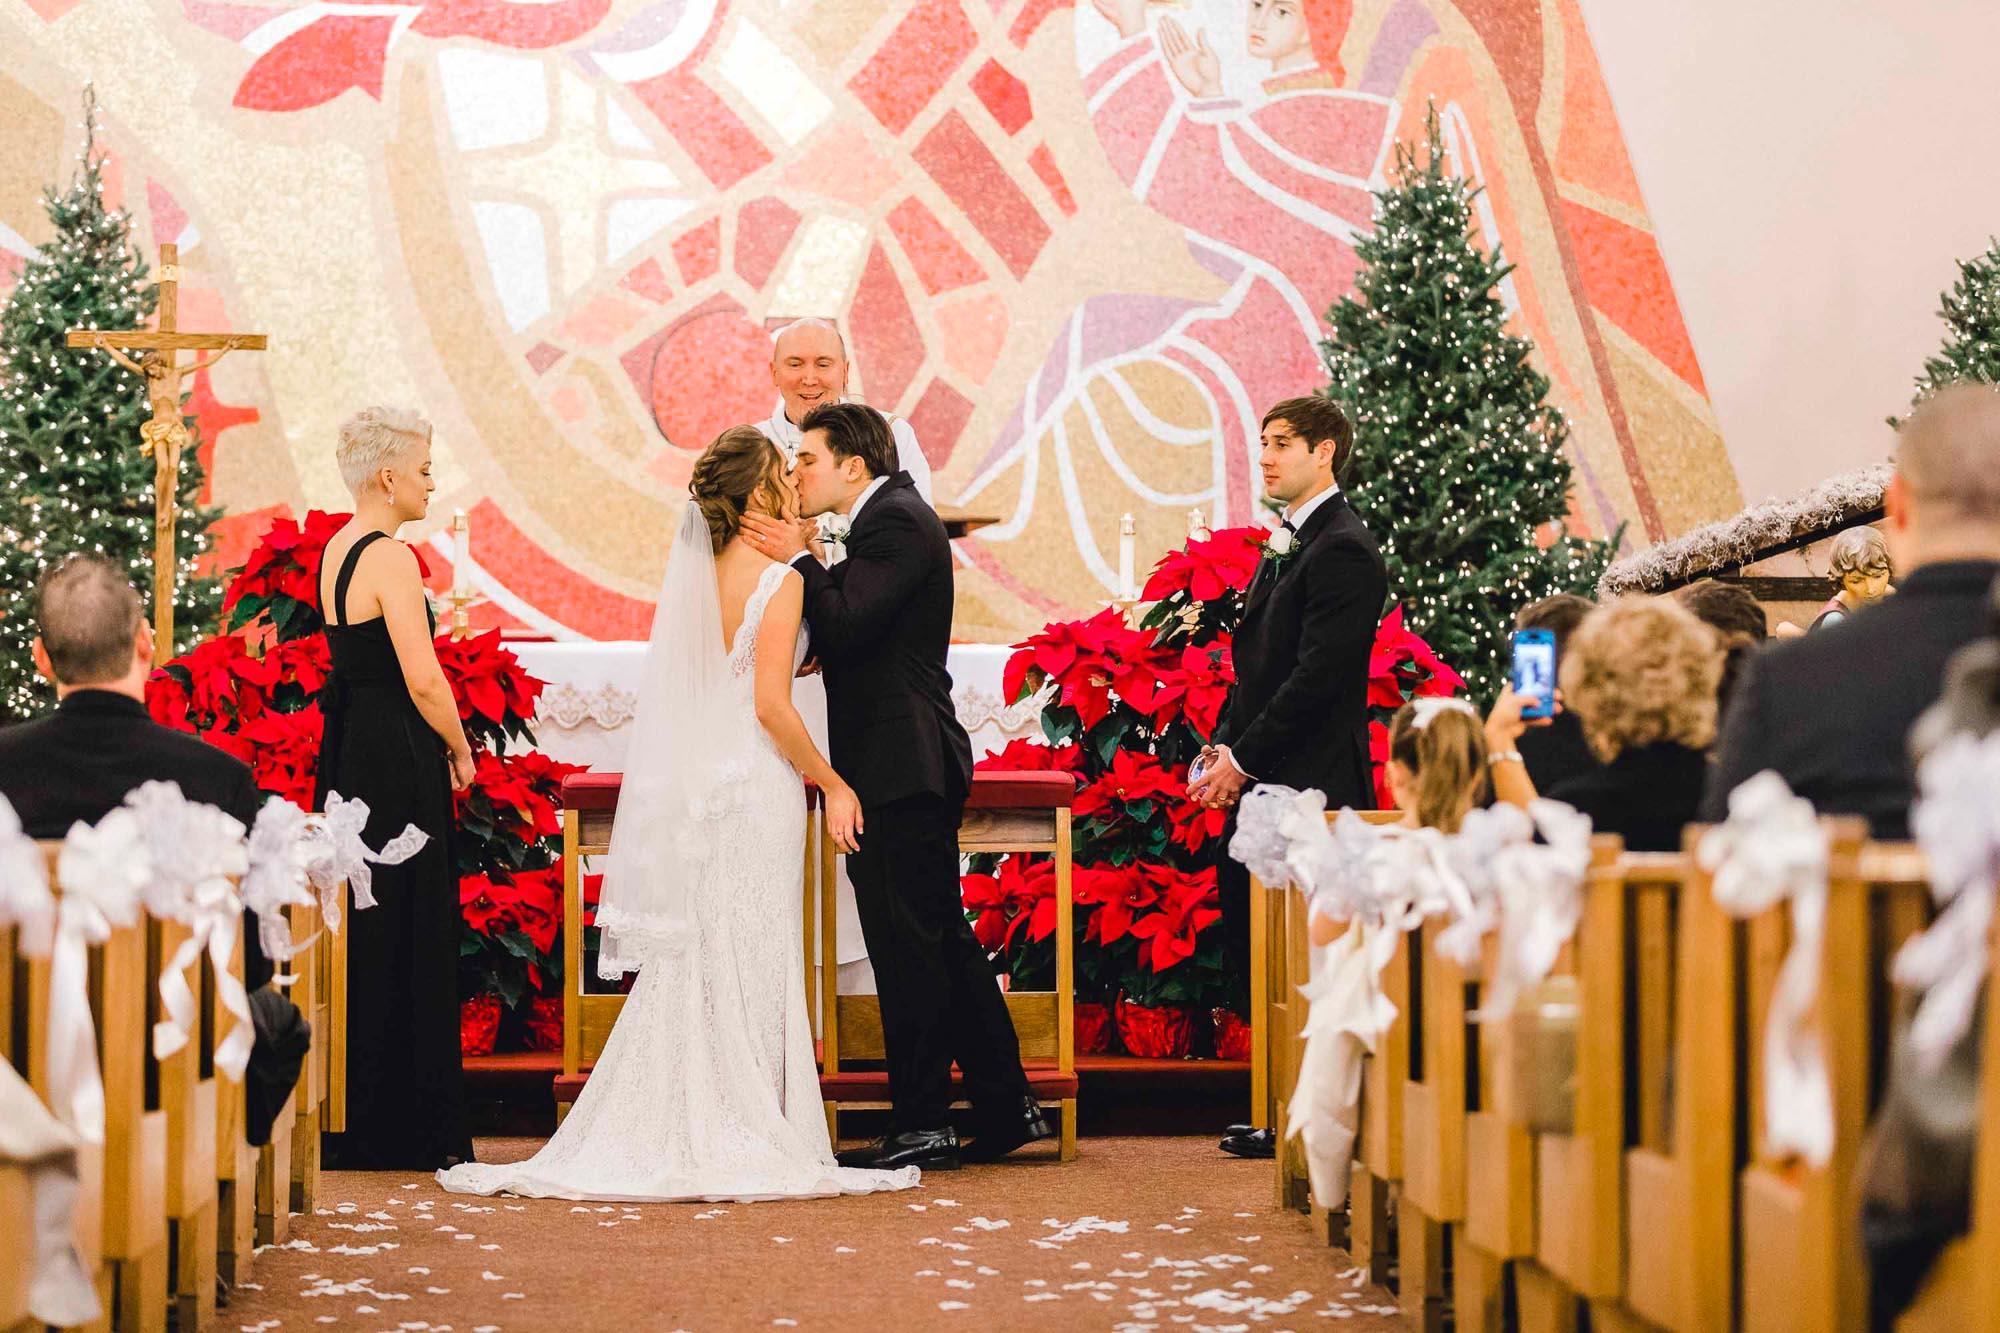 snowy-sand-springs-country-club-drums-pa-christmas-wedding-24382.jpg